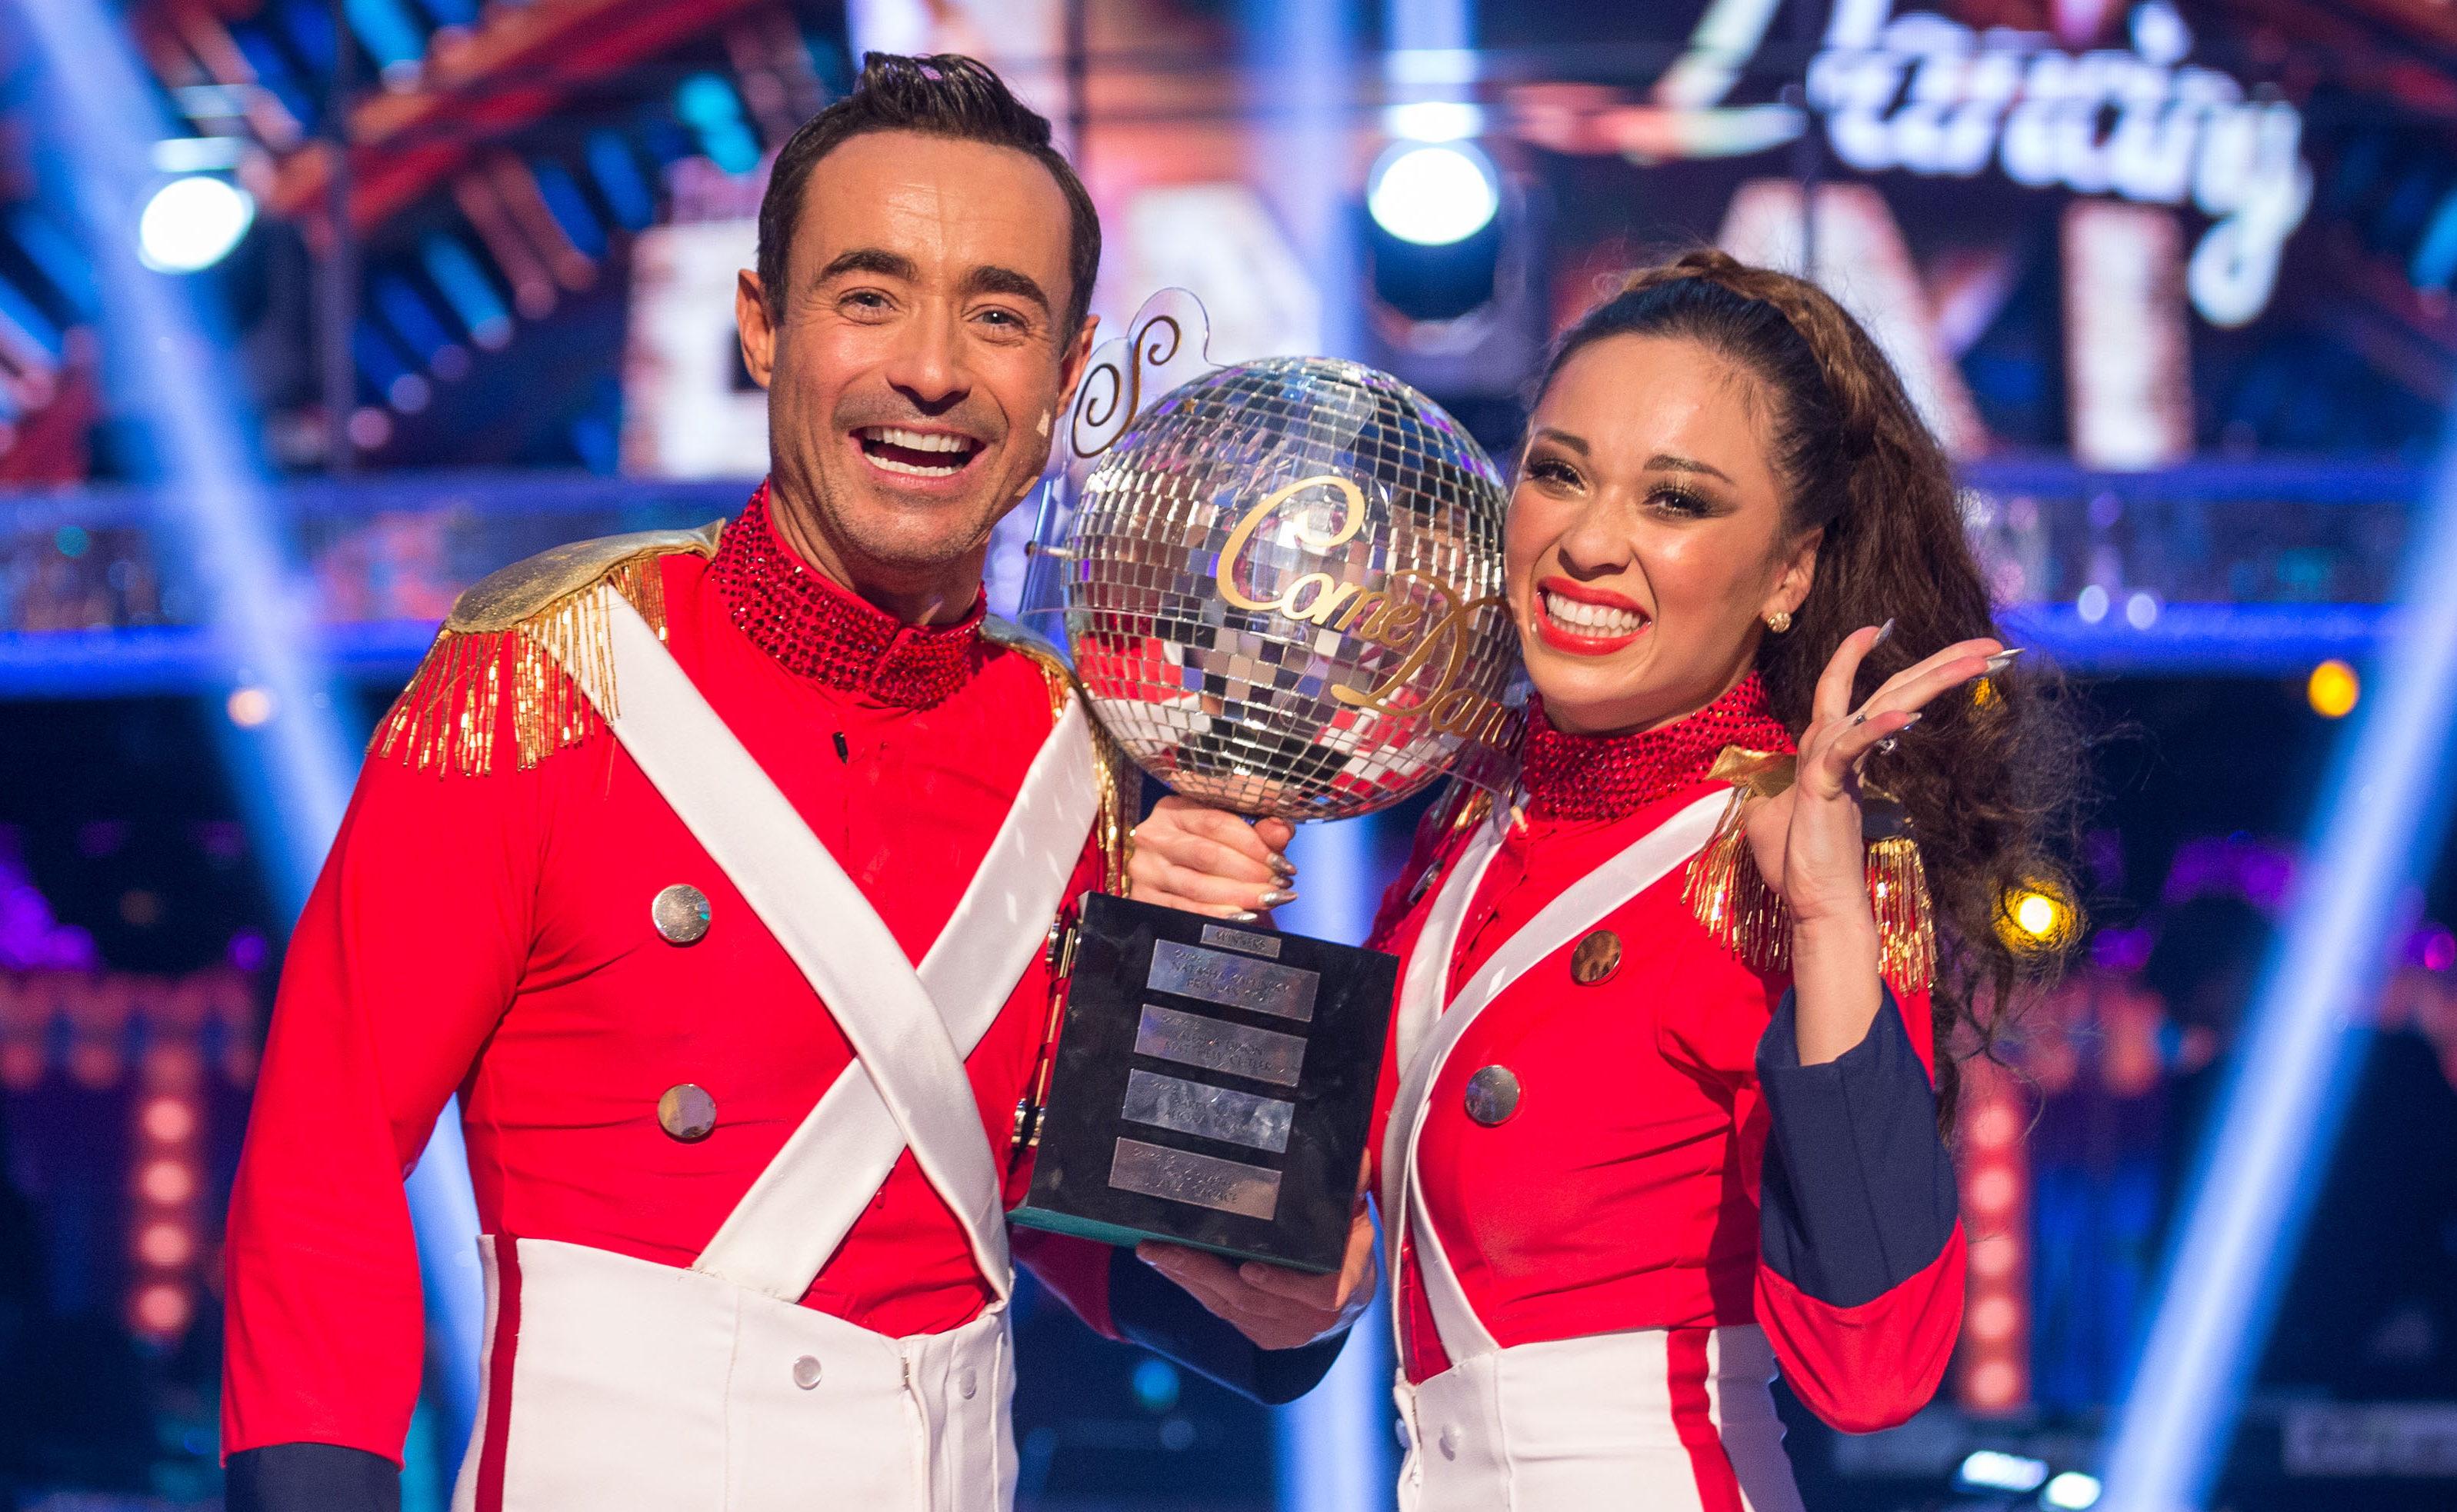 Katya Jones and Joe McFadden with the glitterball trophy (Guy Levy/BBC/PA Wire)